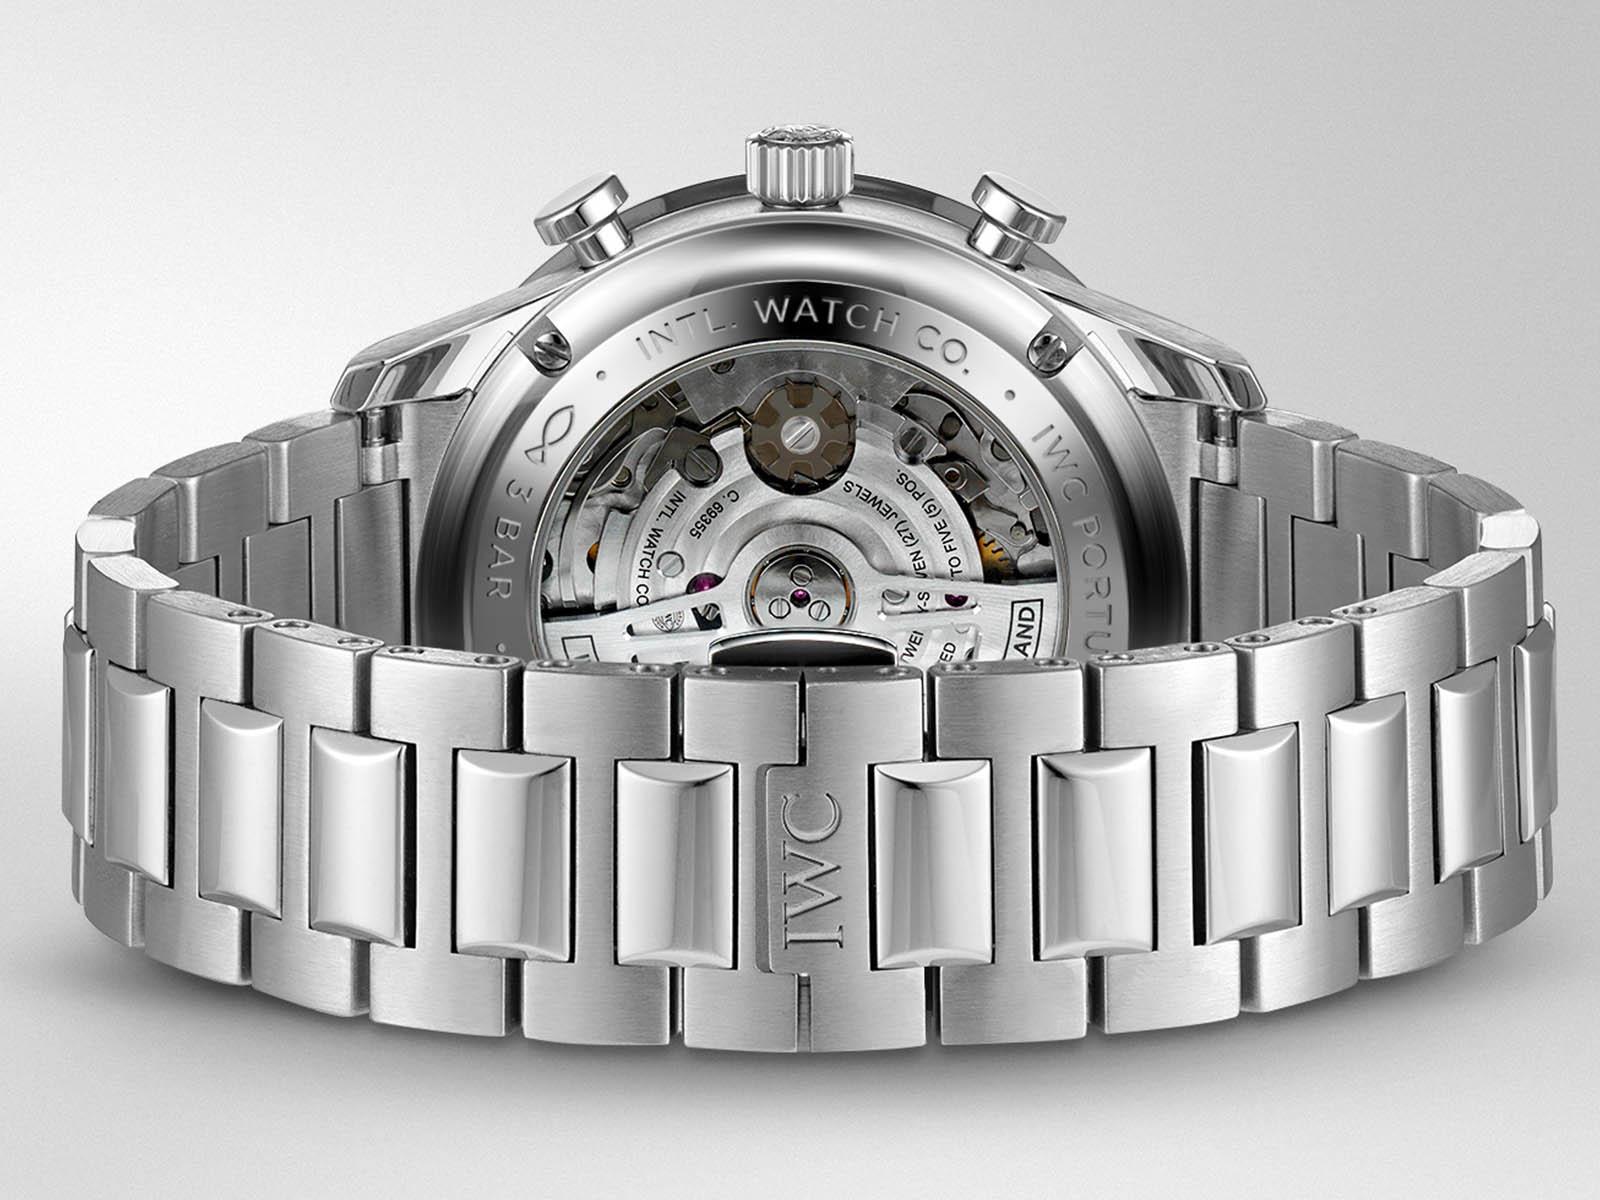 iw371617-iwc-portugieser-chronograph-stainless-steel-bracelet-7.jpg